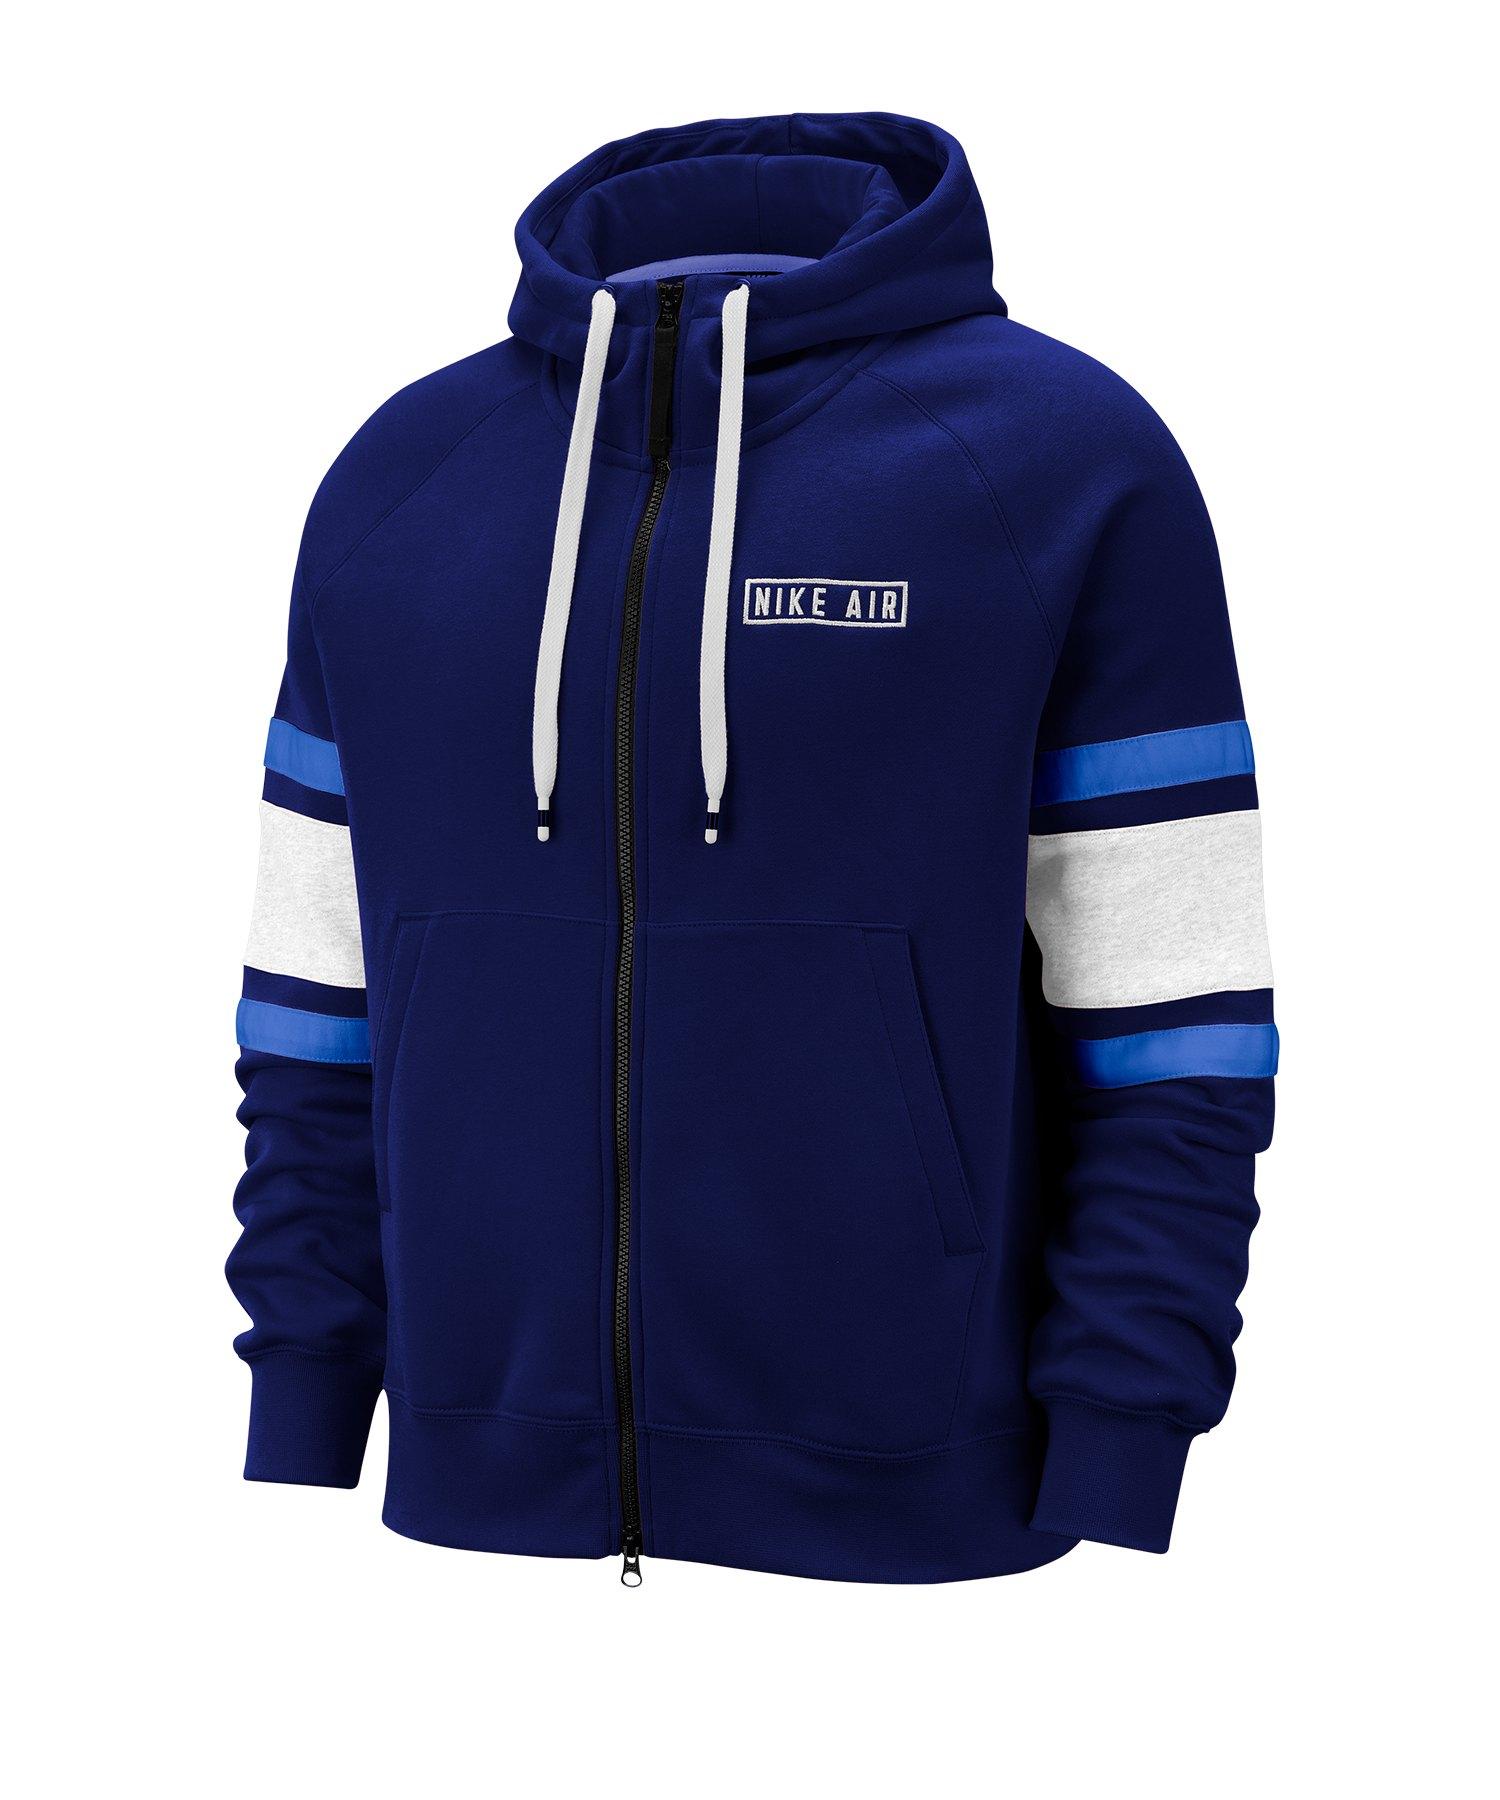 Nike Air Fleece Kapuzenjacke Blau F492 - blau